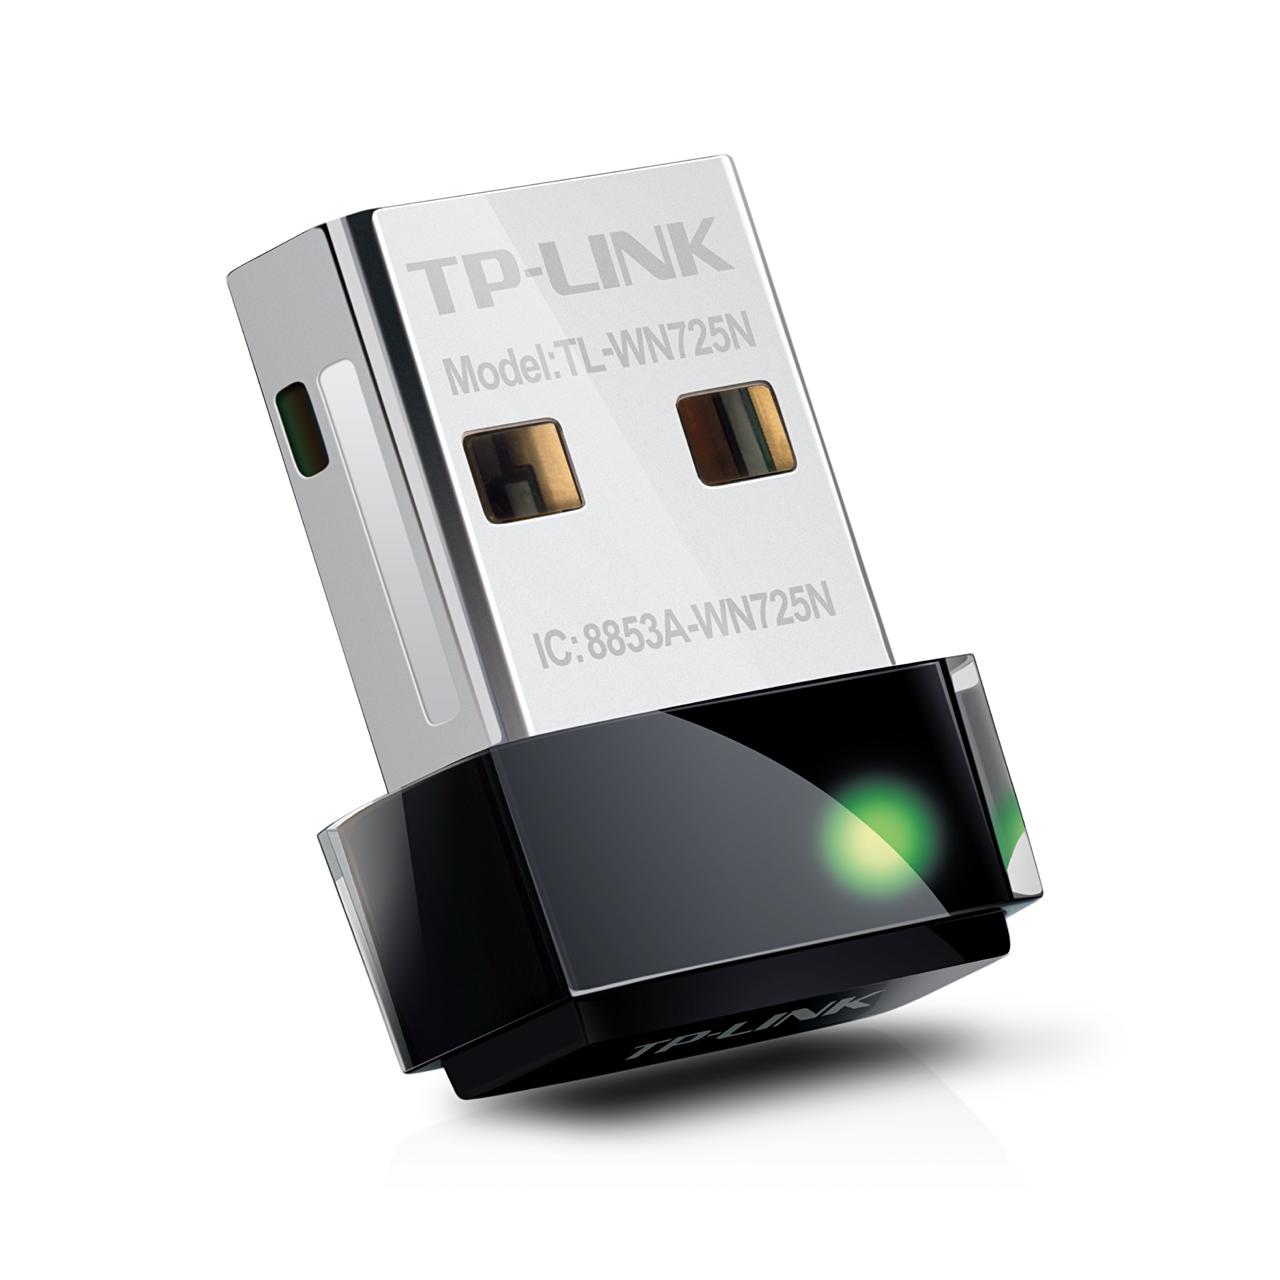 d-link wireless n nano usb adapter драйвер скачать